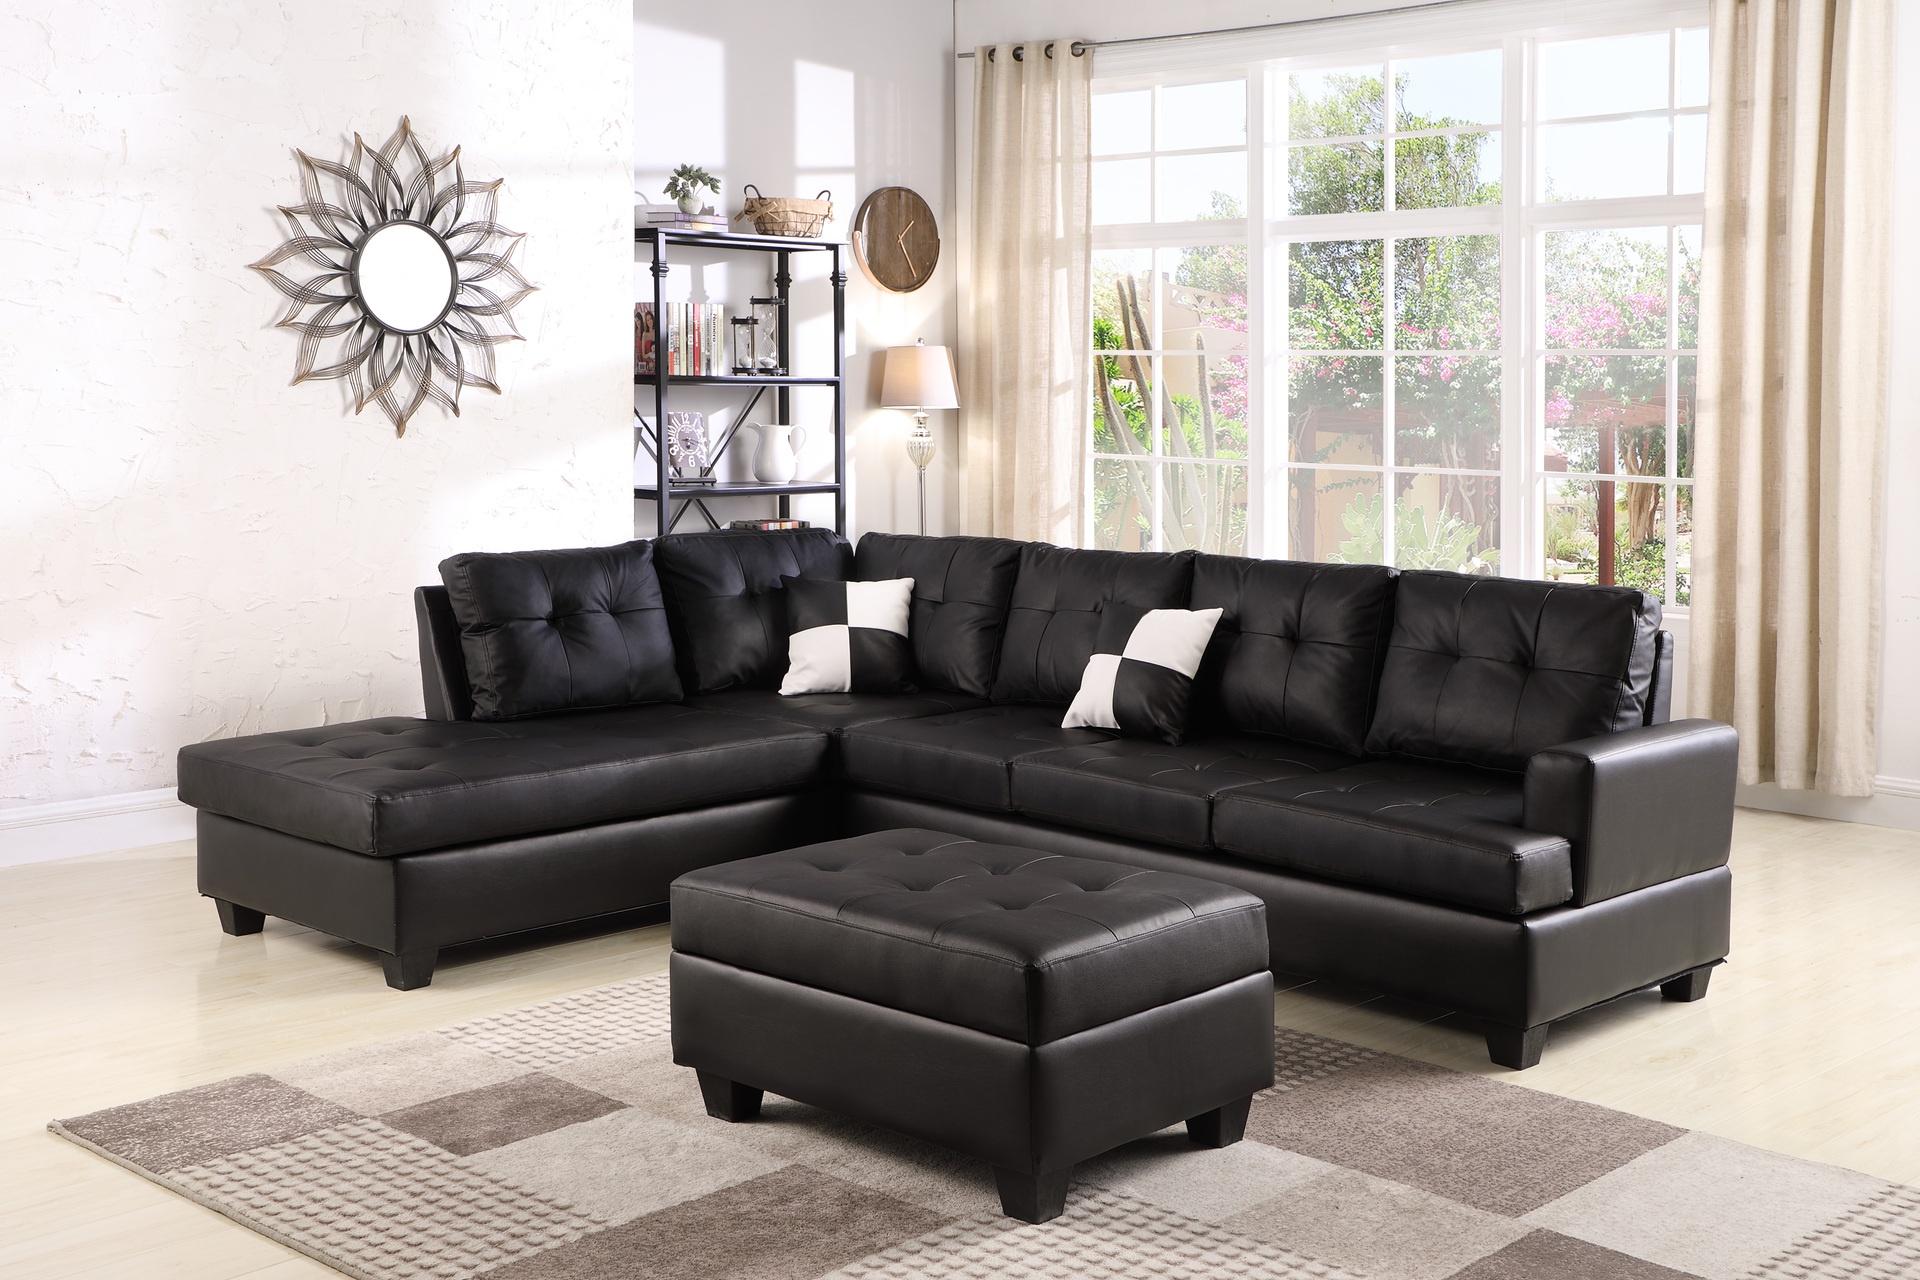 Ashton 5 Seater Corner Sofa LOUNGE SUITES